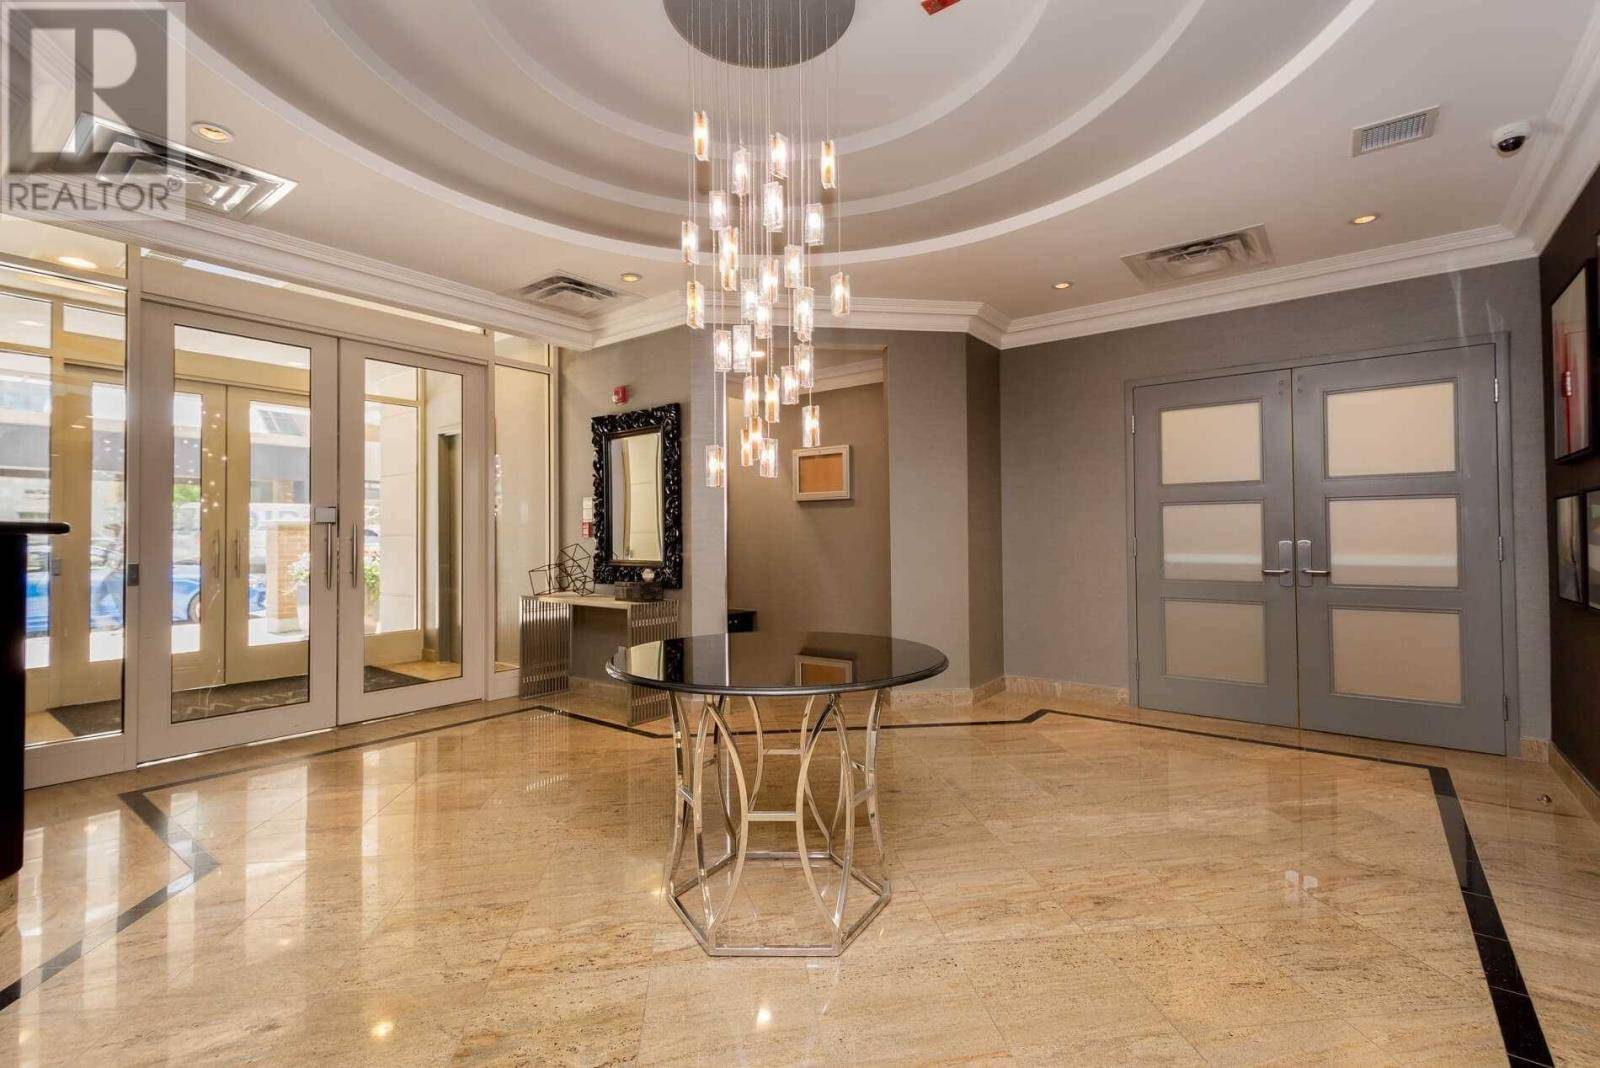 Enjoyable 204 60 St Clair Avenue West Toronto For Rent 2 450 Home Interior And Landscaping Spoatsignezvosmurscom